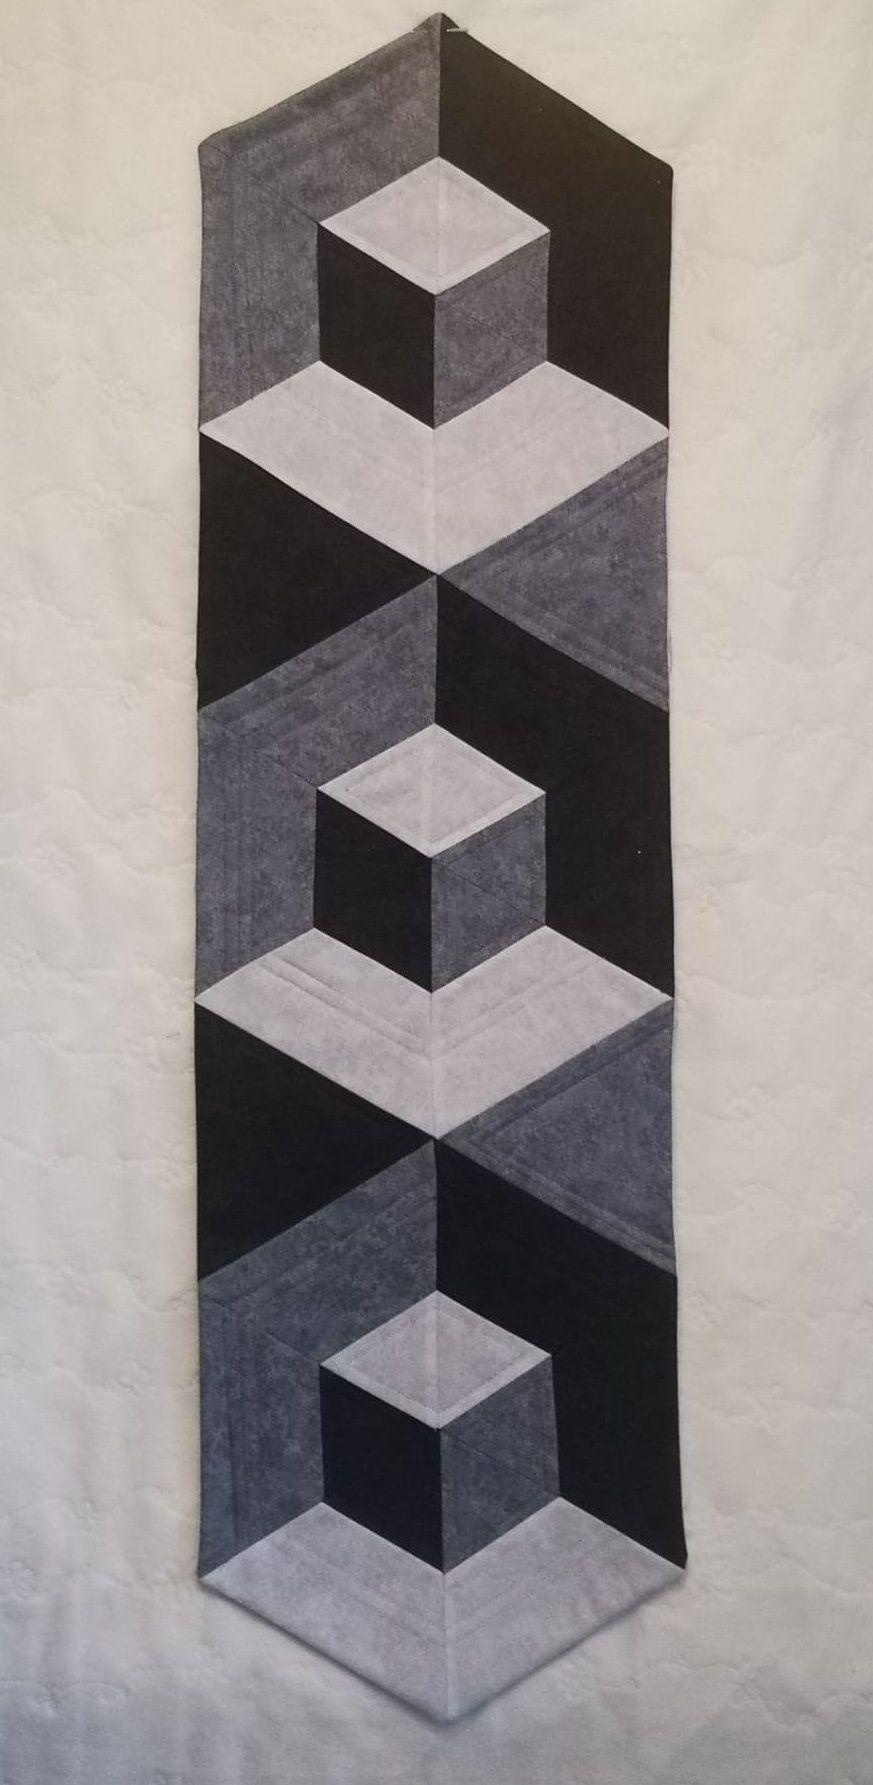 Illusion Table Runner Pattern - Digital Download